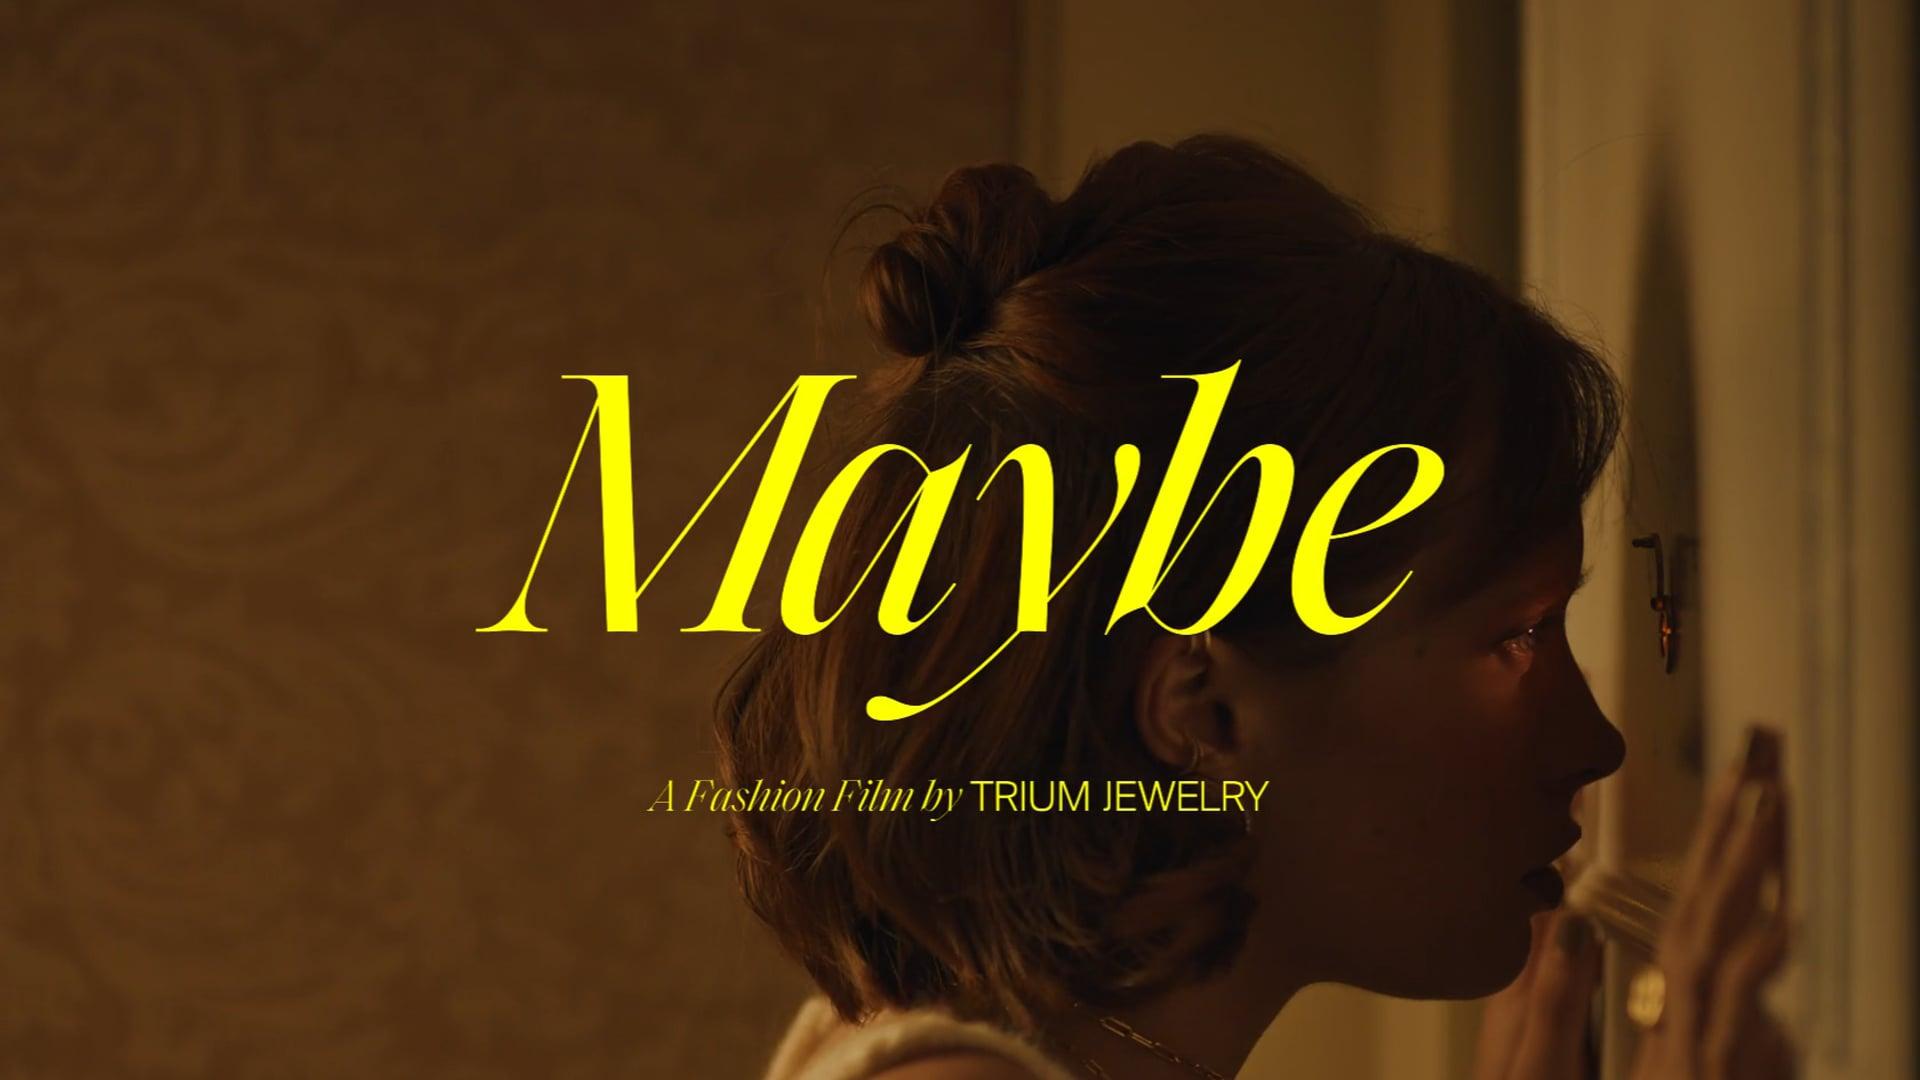 TRIUM JEWELRY 'Maybe'